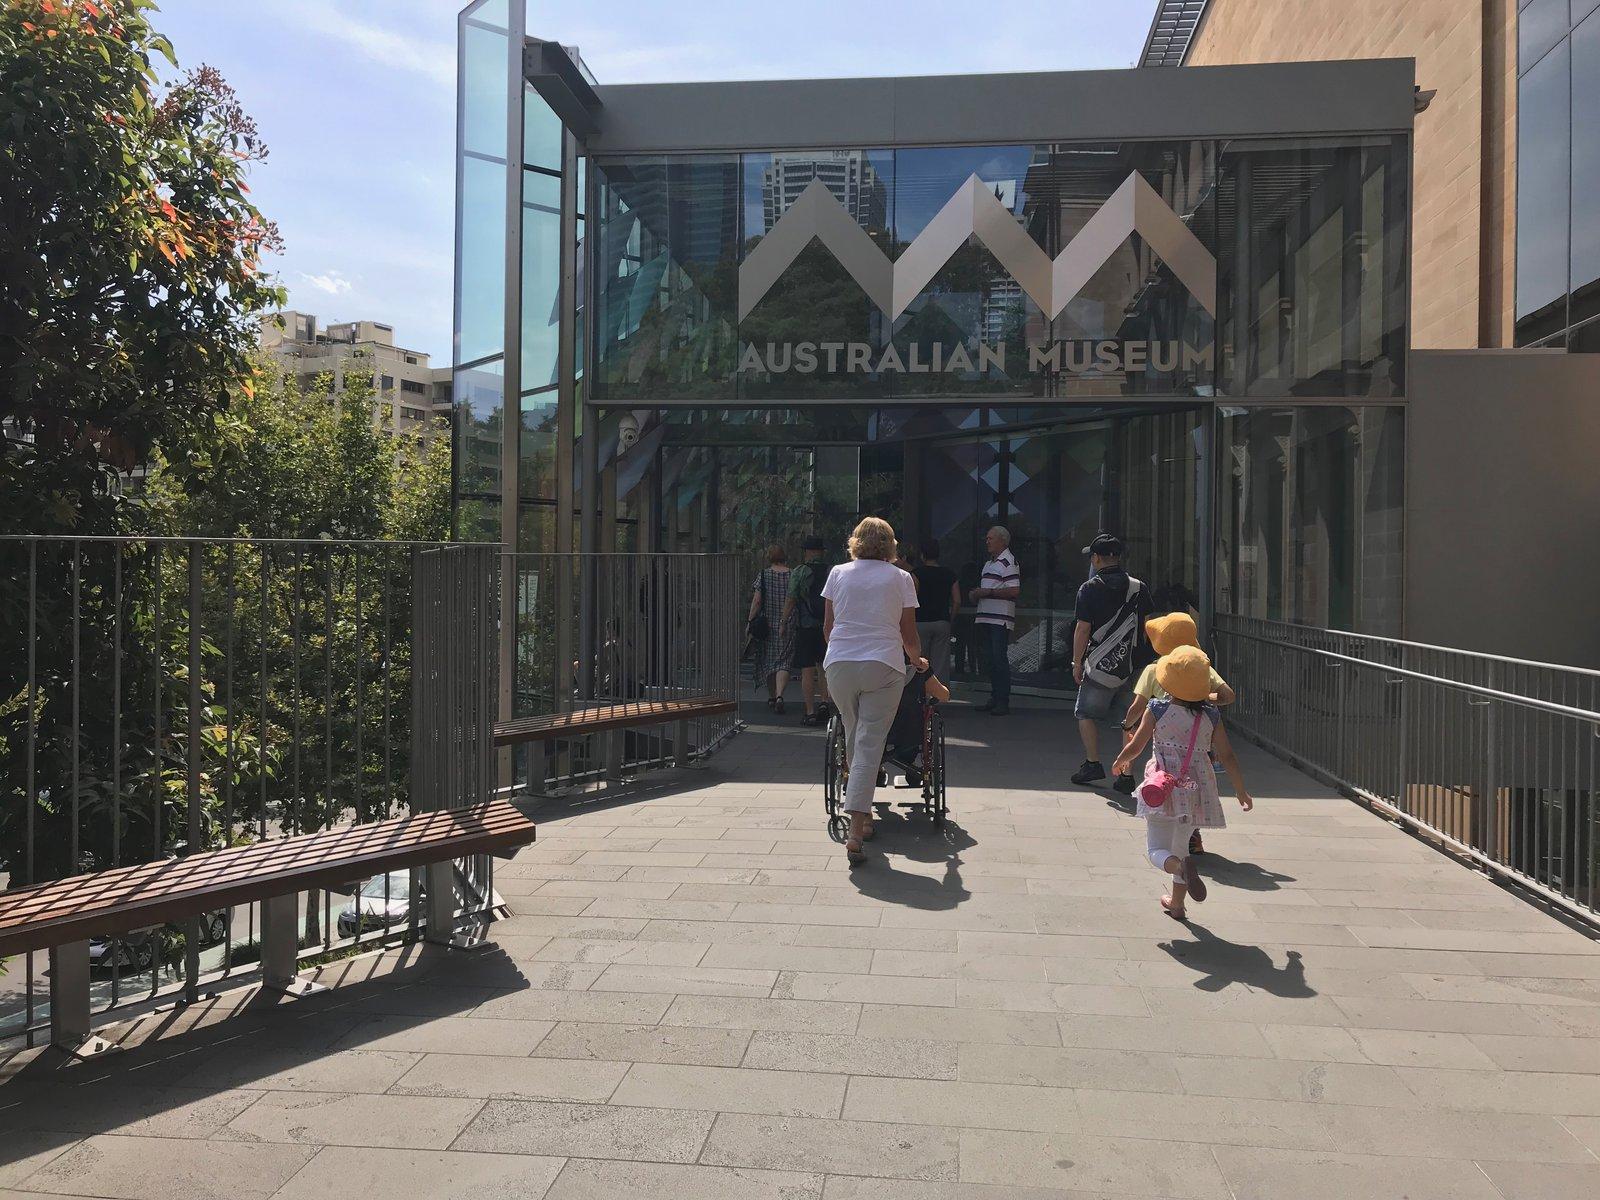 Museum walk entrance